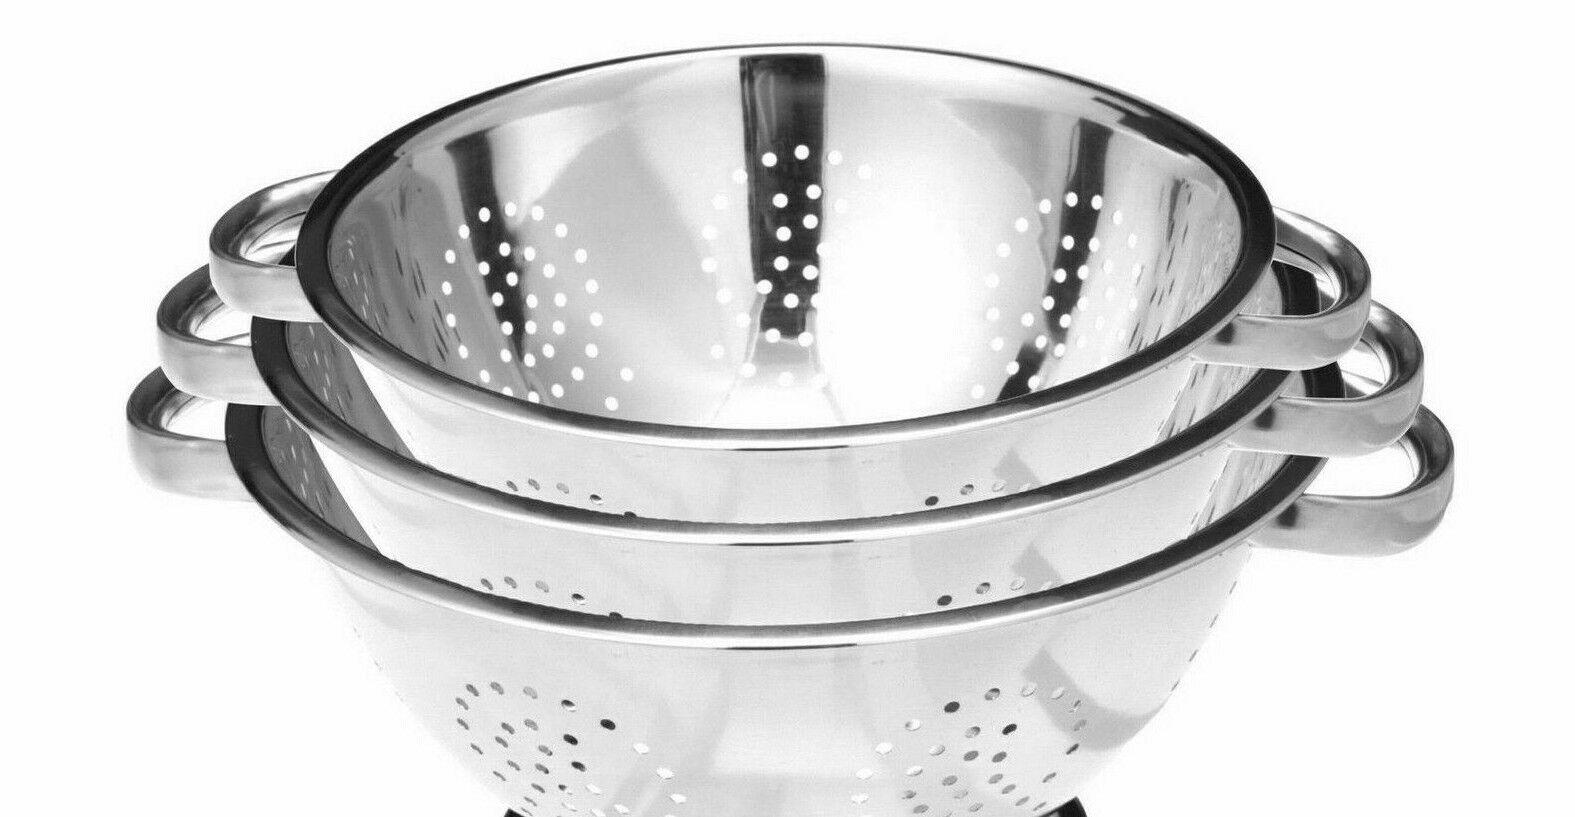 New Stainless Steel Strainer Colander Basket Deep Kitchen Colander Set of 3 Colanders, Strainers & Sifters